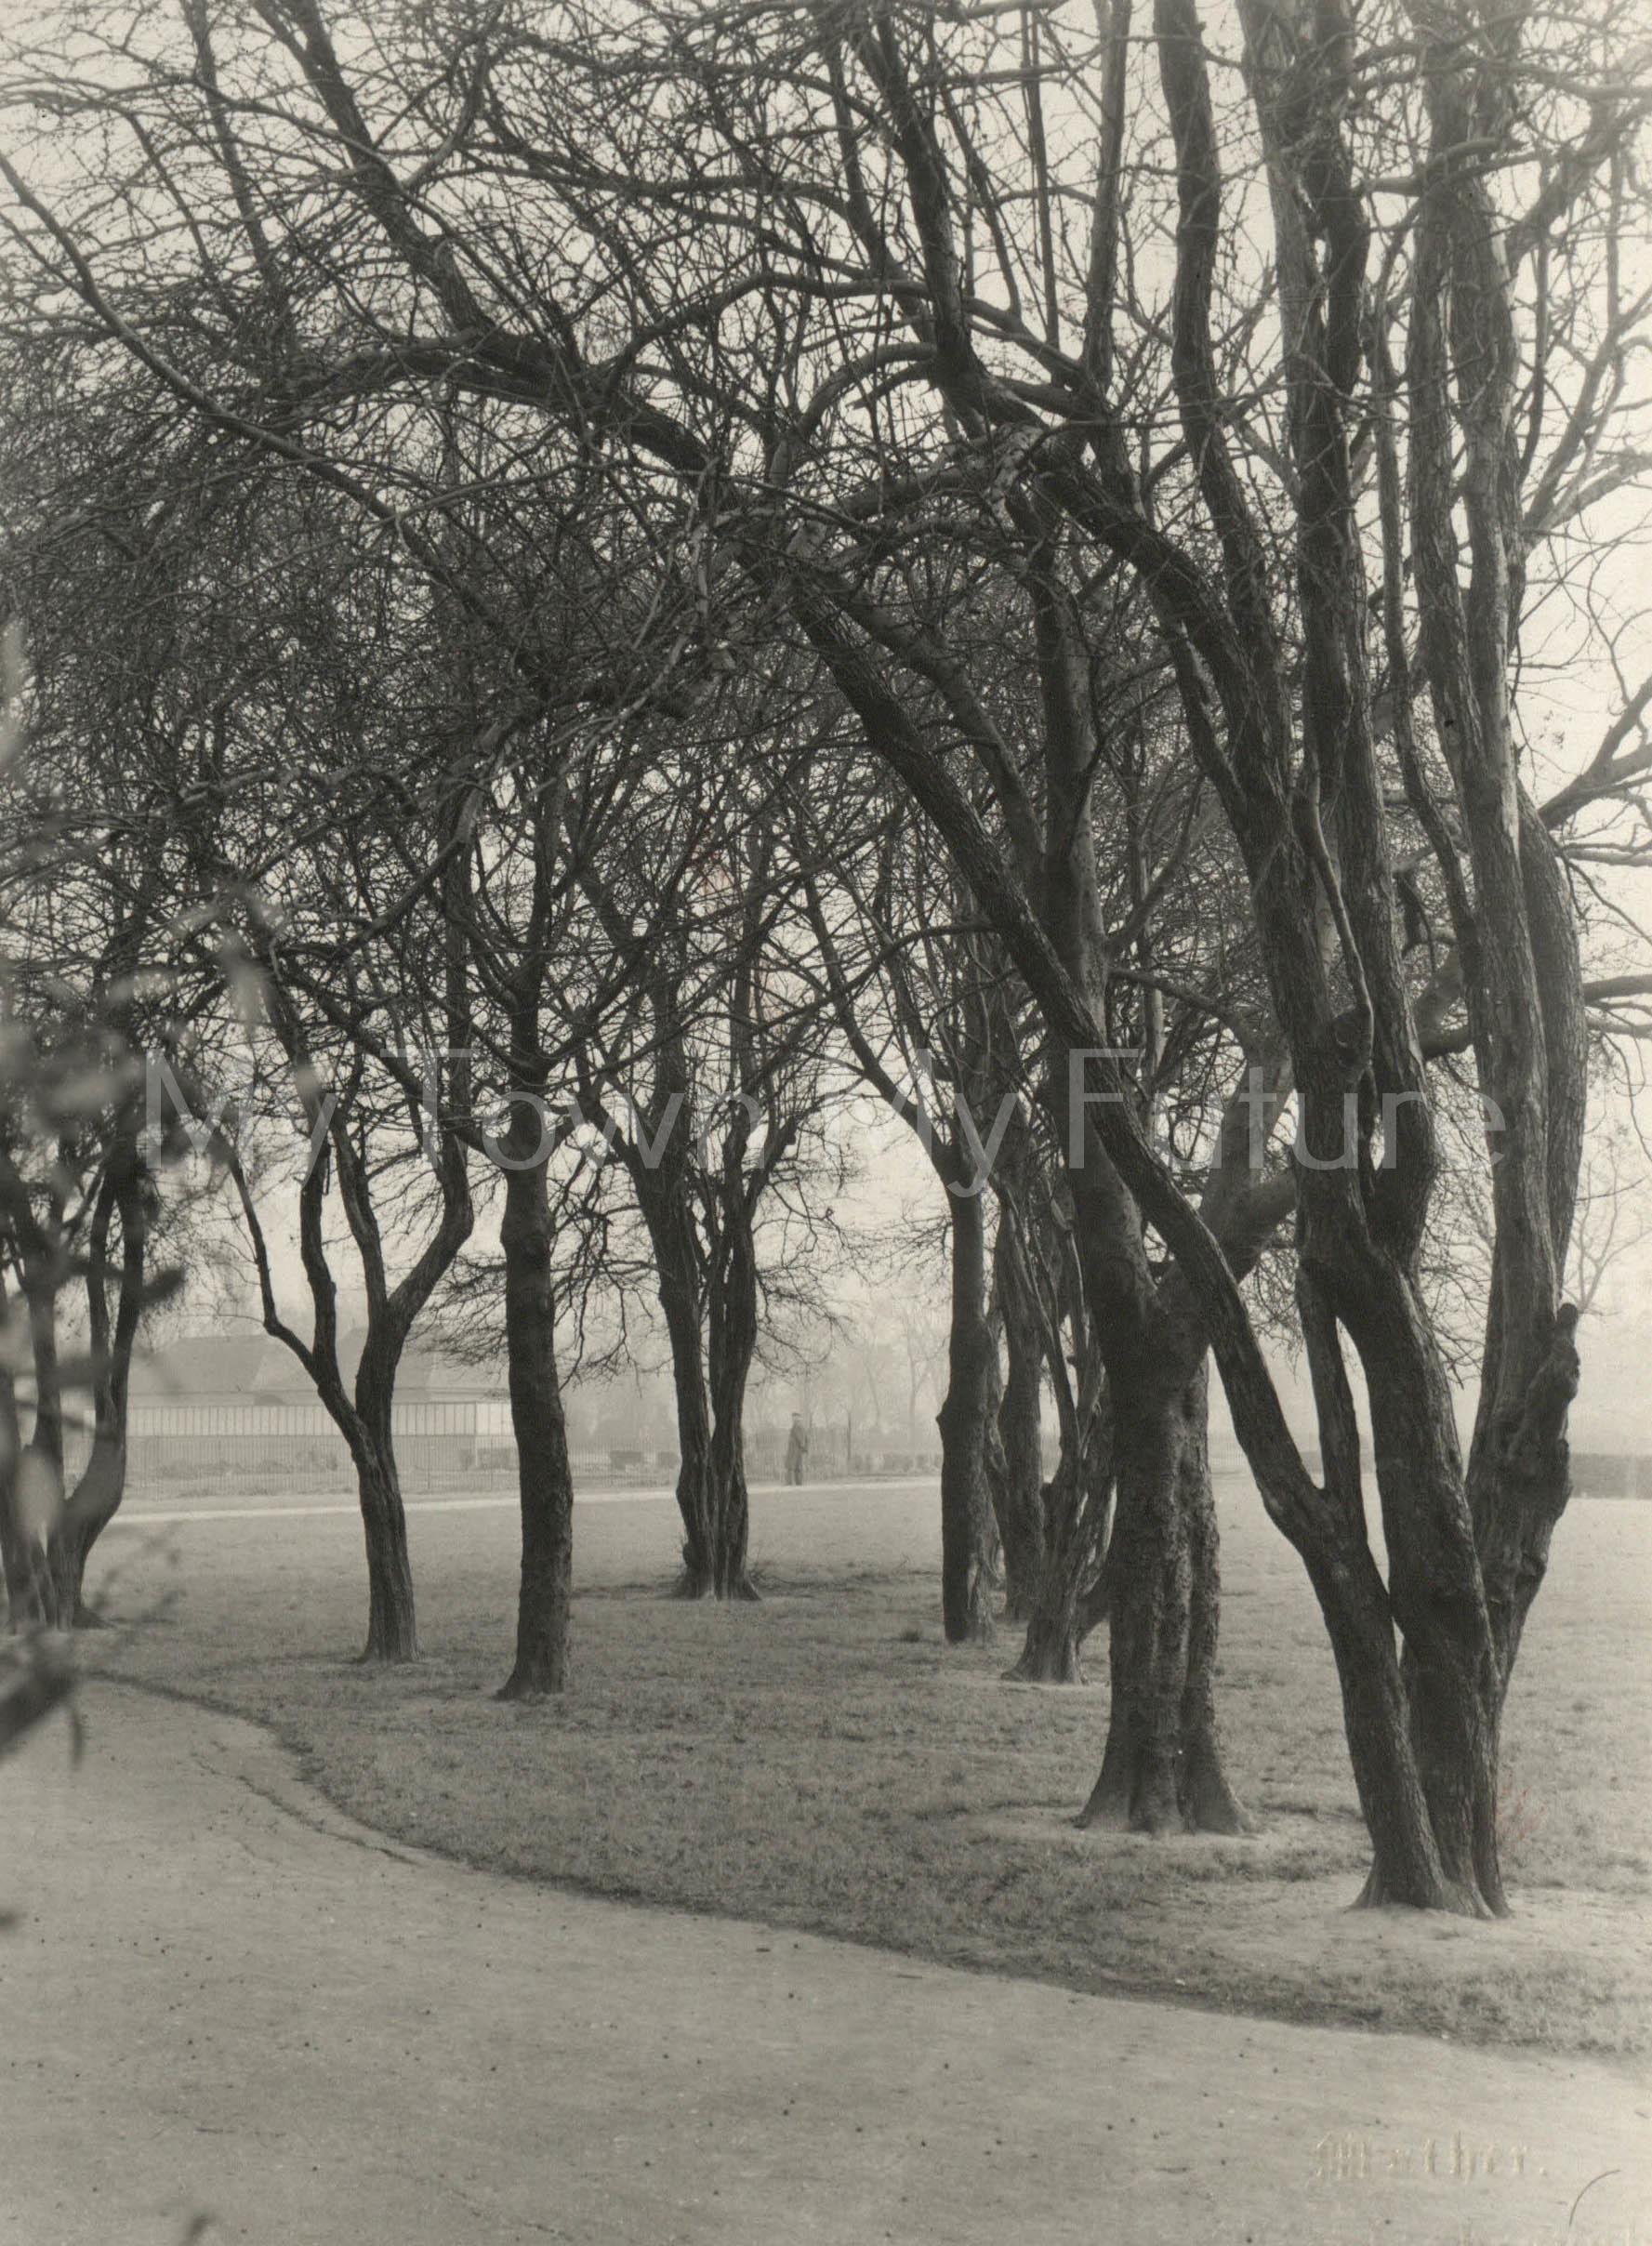 Albert Park - Sailor's Trod, February 1949, Mather's Photographers, 140 Linthorpe Road, Middlesbrough